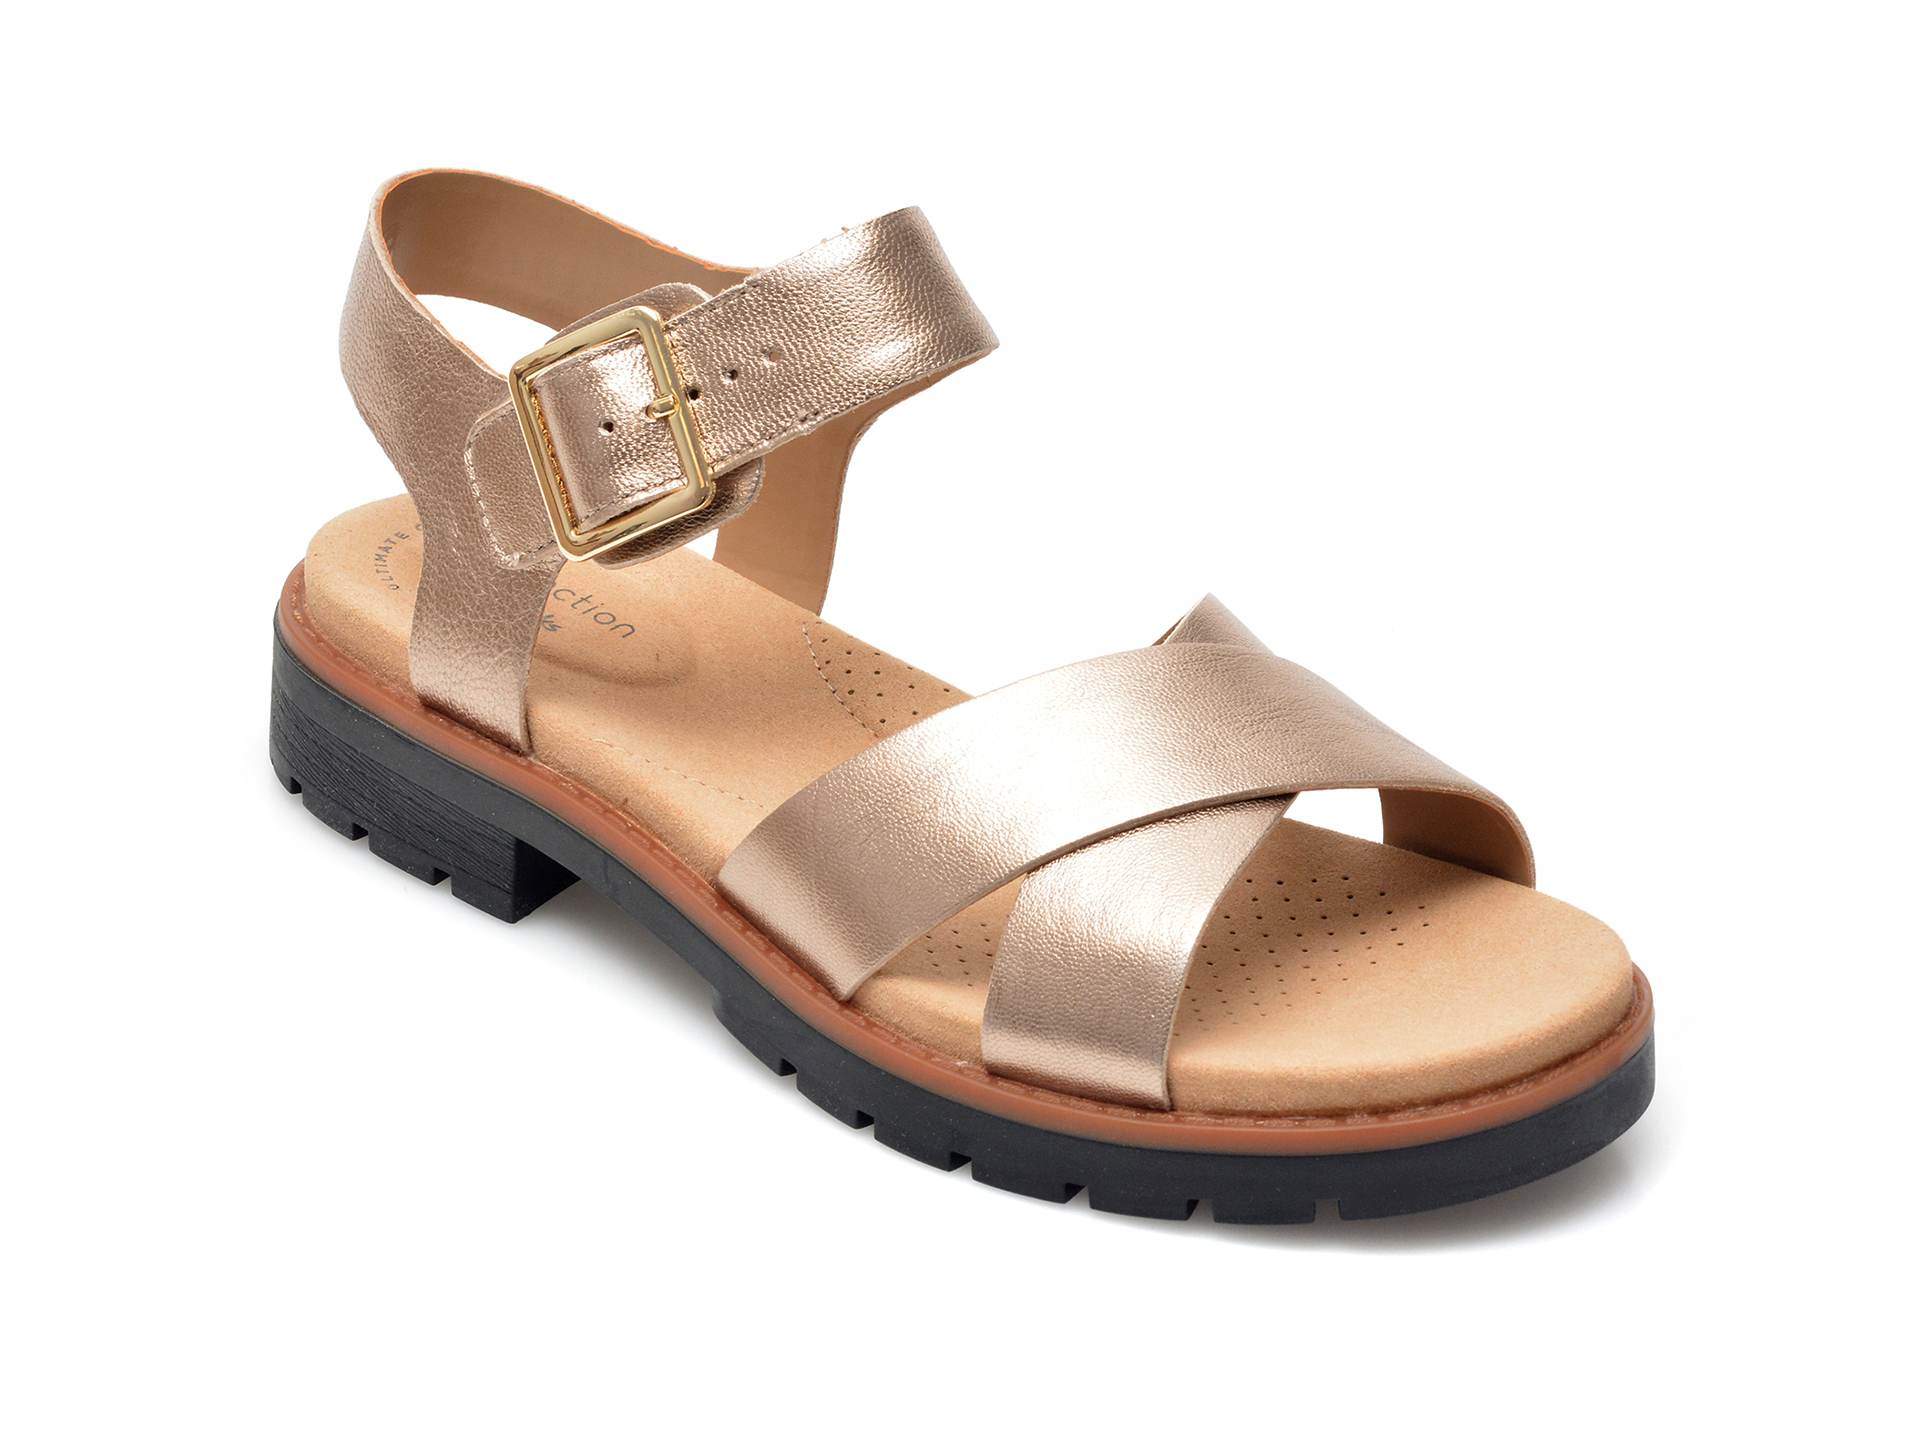 Sandale CLARKS aurii, Orinoco Strap, din piele naturala imagine otter.ro 2021